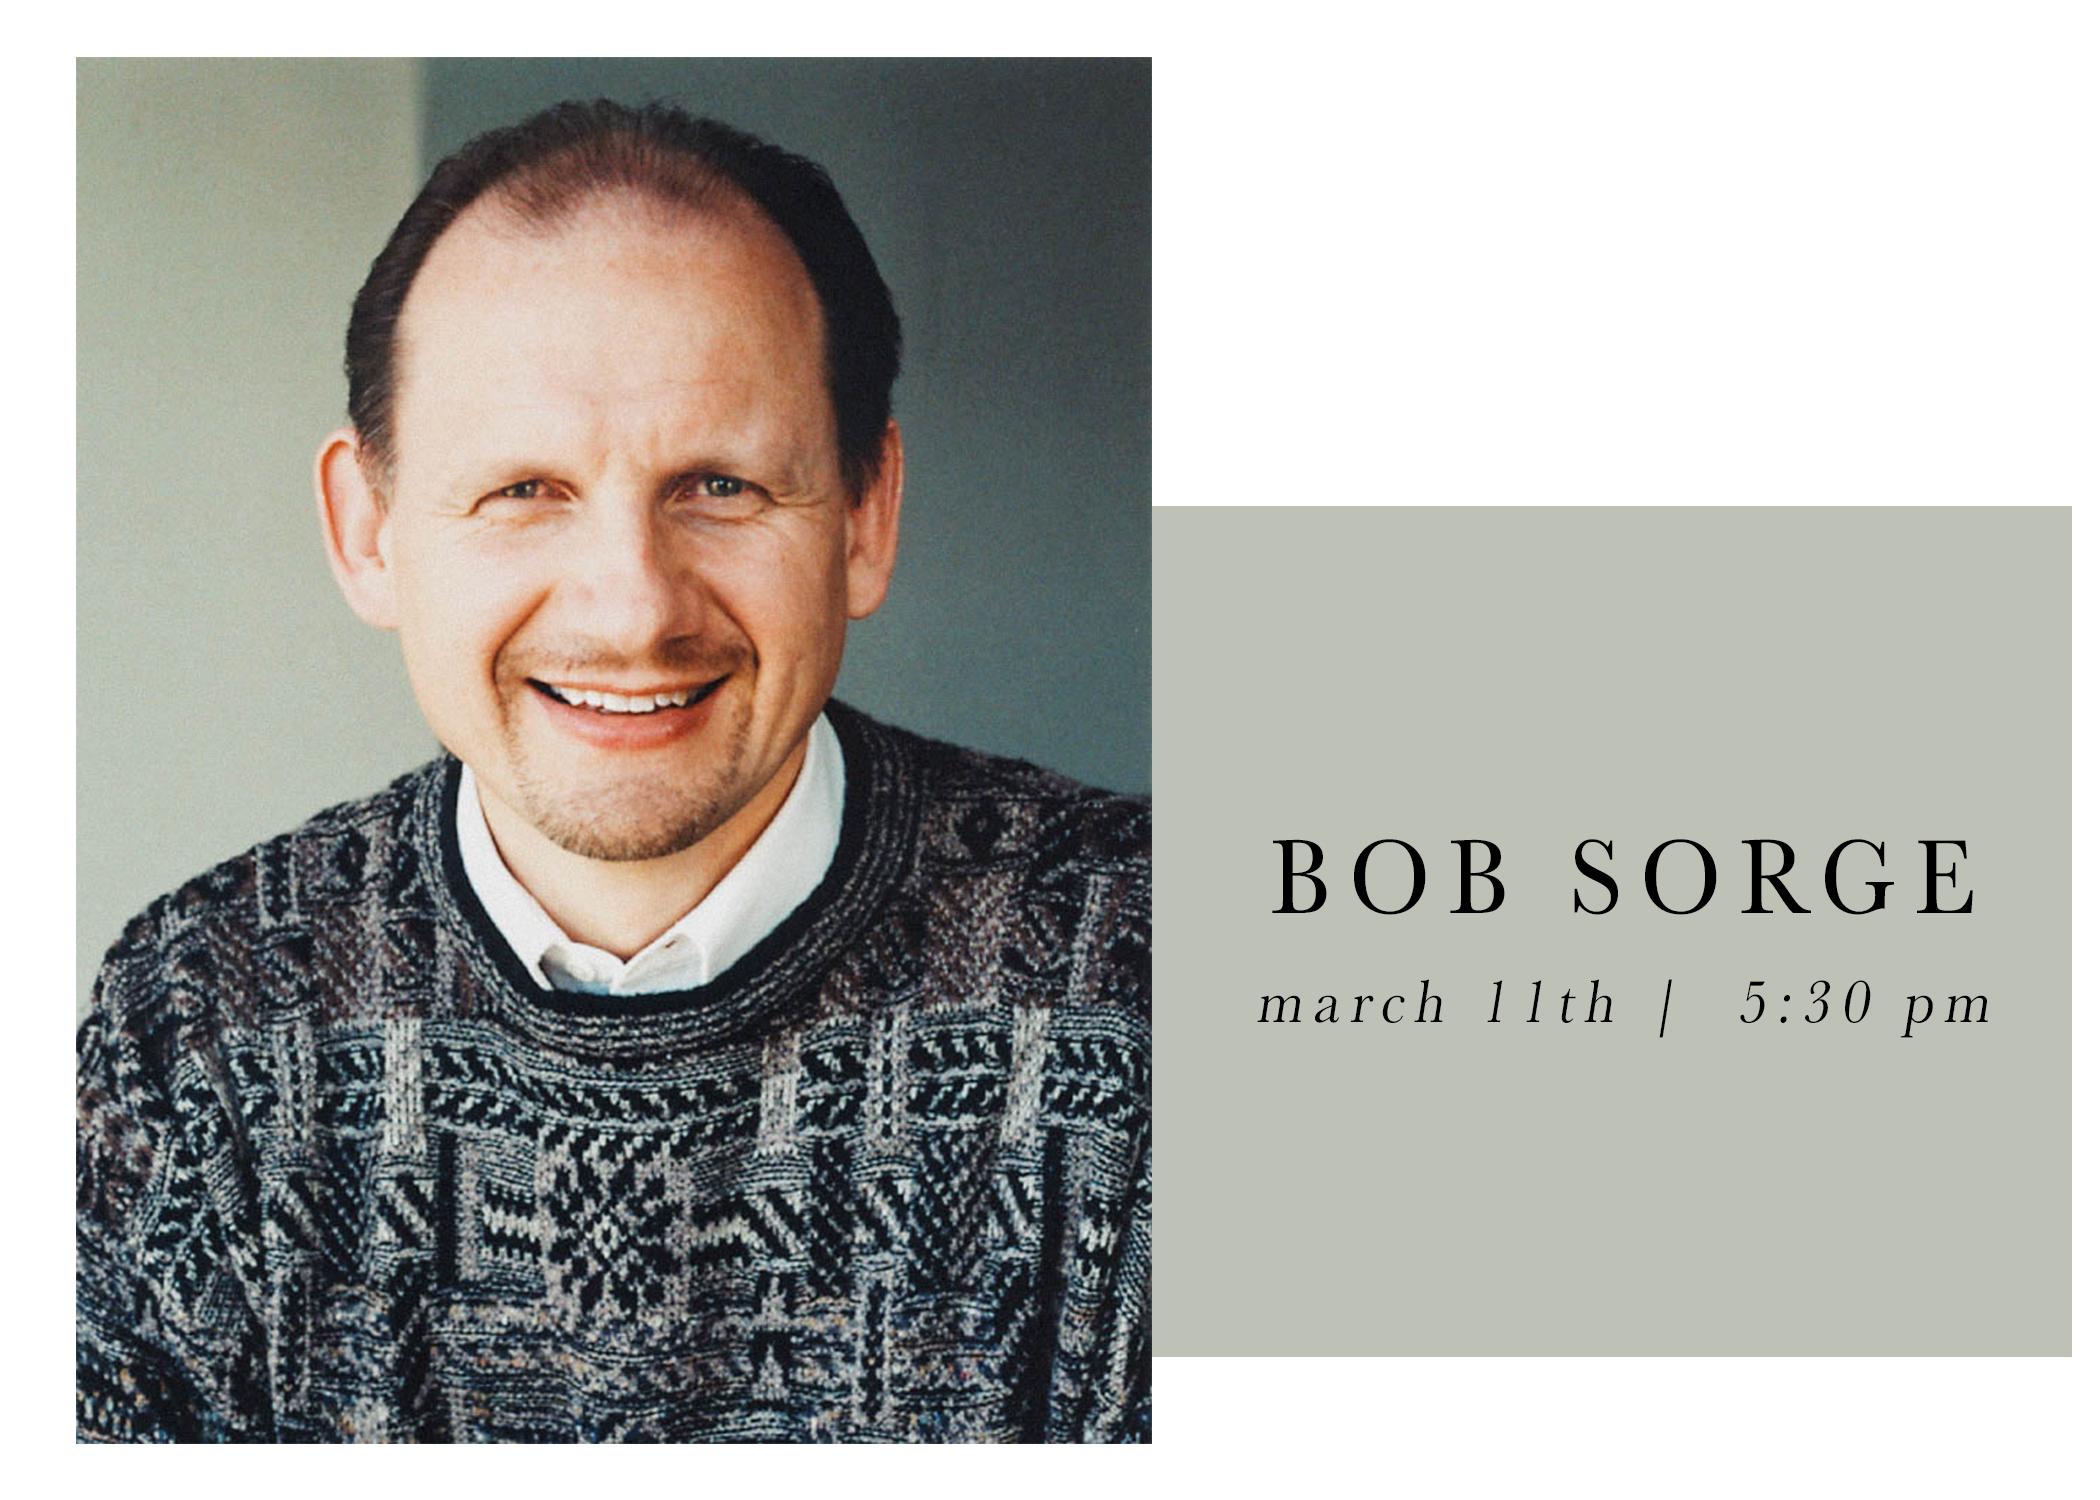 Bob Sorge Graphic.jpg